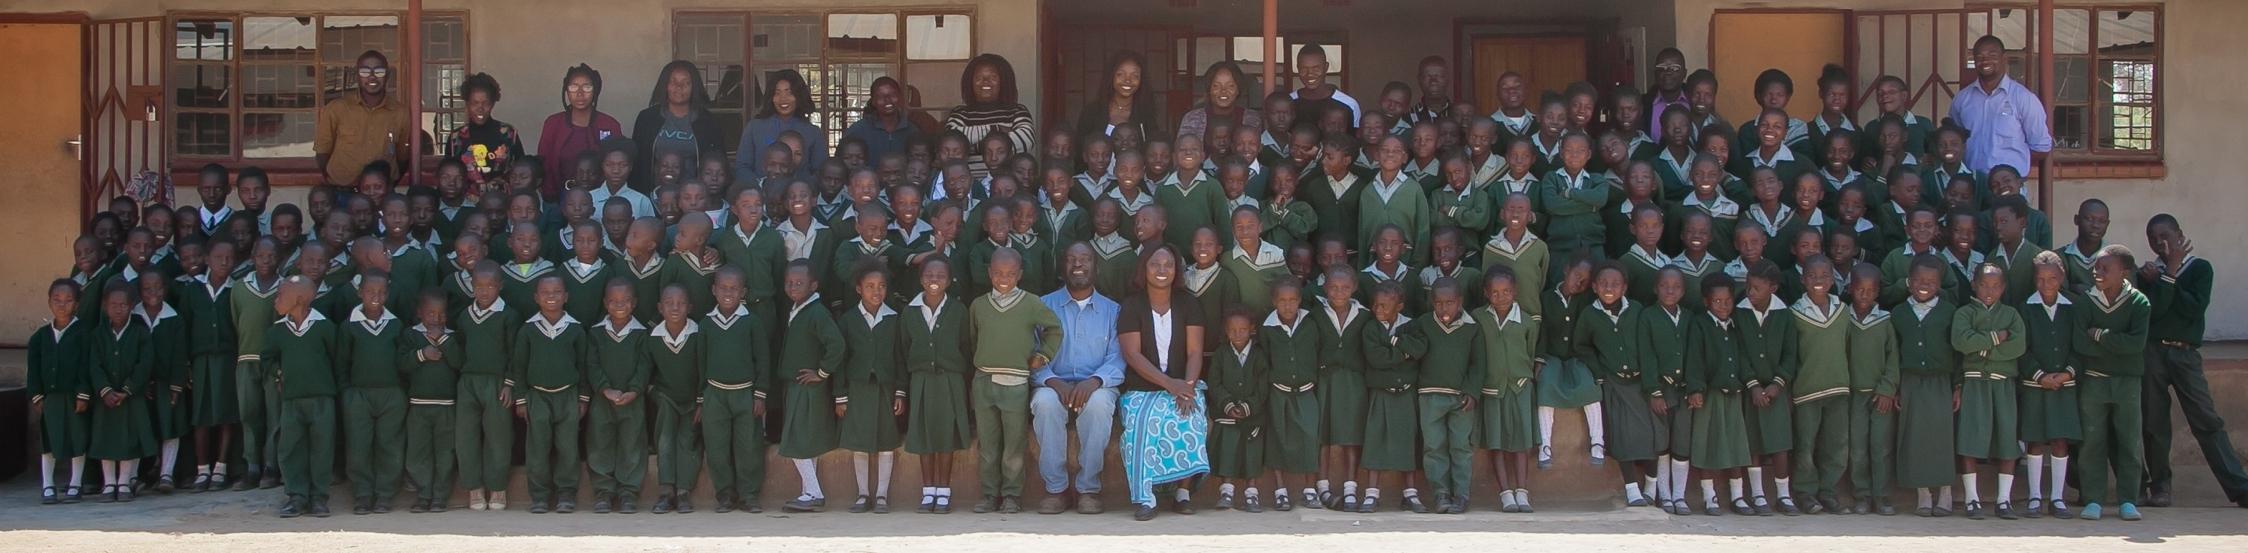 BCA George, Zambia in 2018